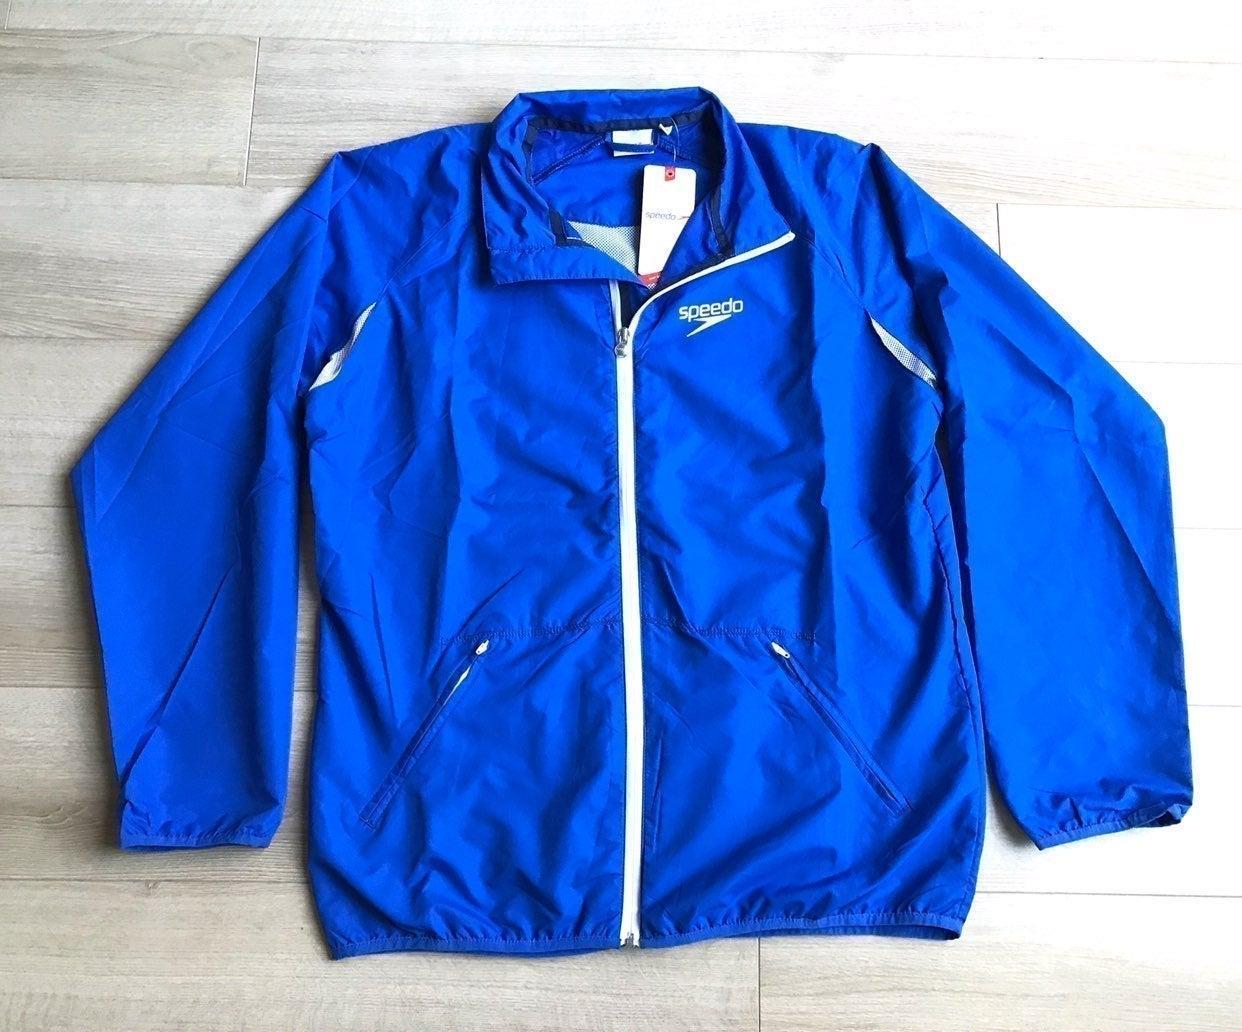 Speedo Mens Lined Jacket sizeXXL NEW